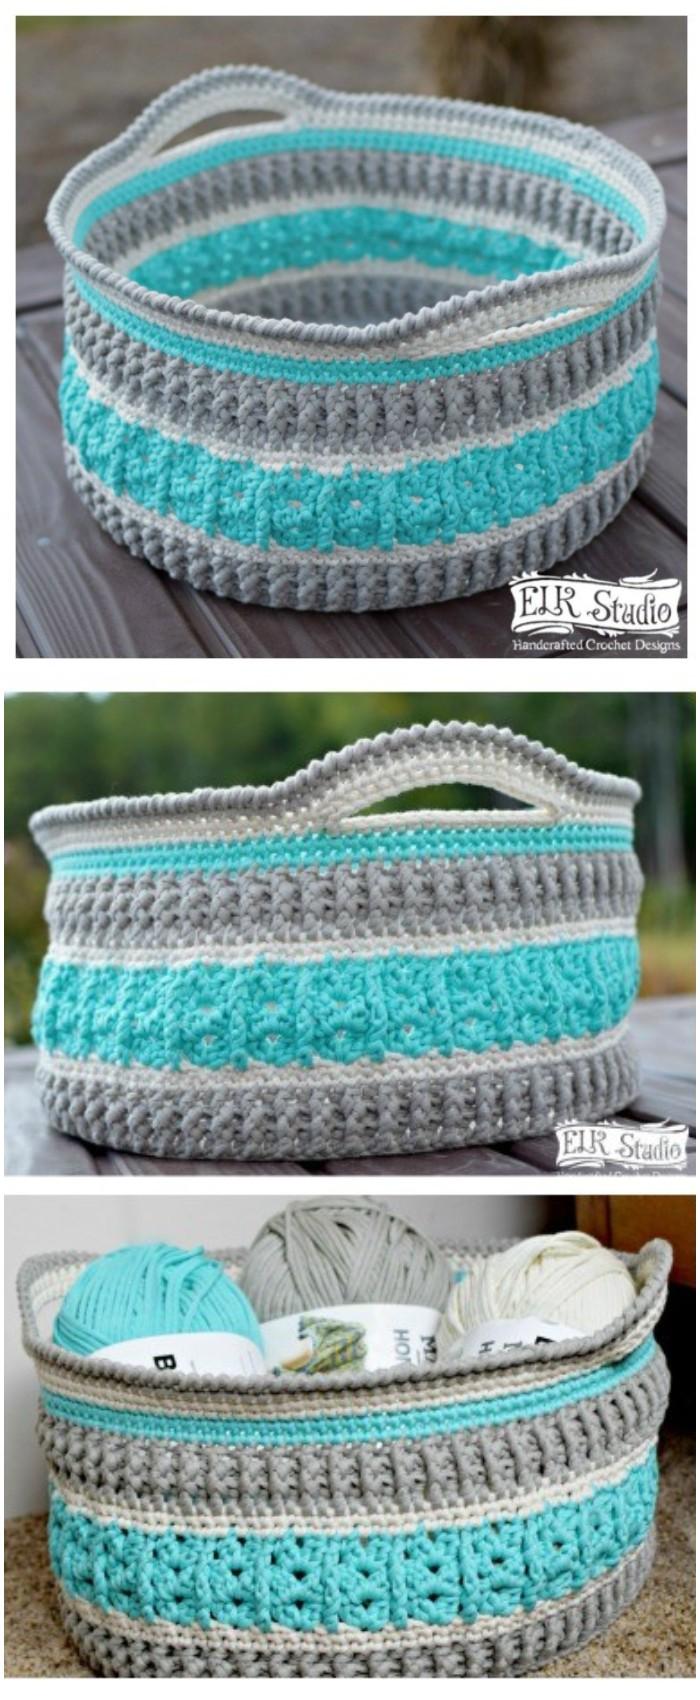 Textured Crochet Basket Free Pattern